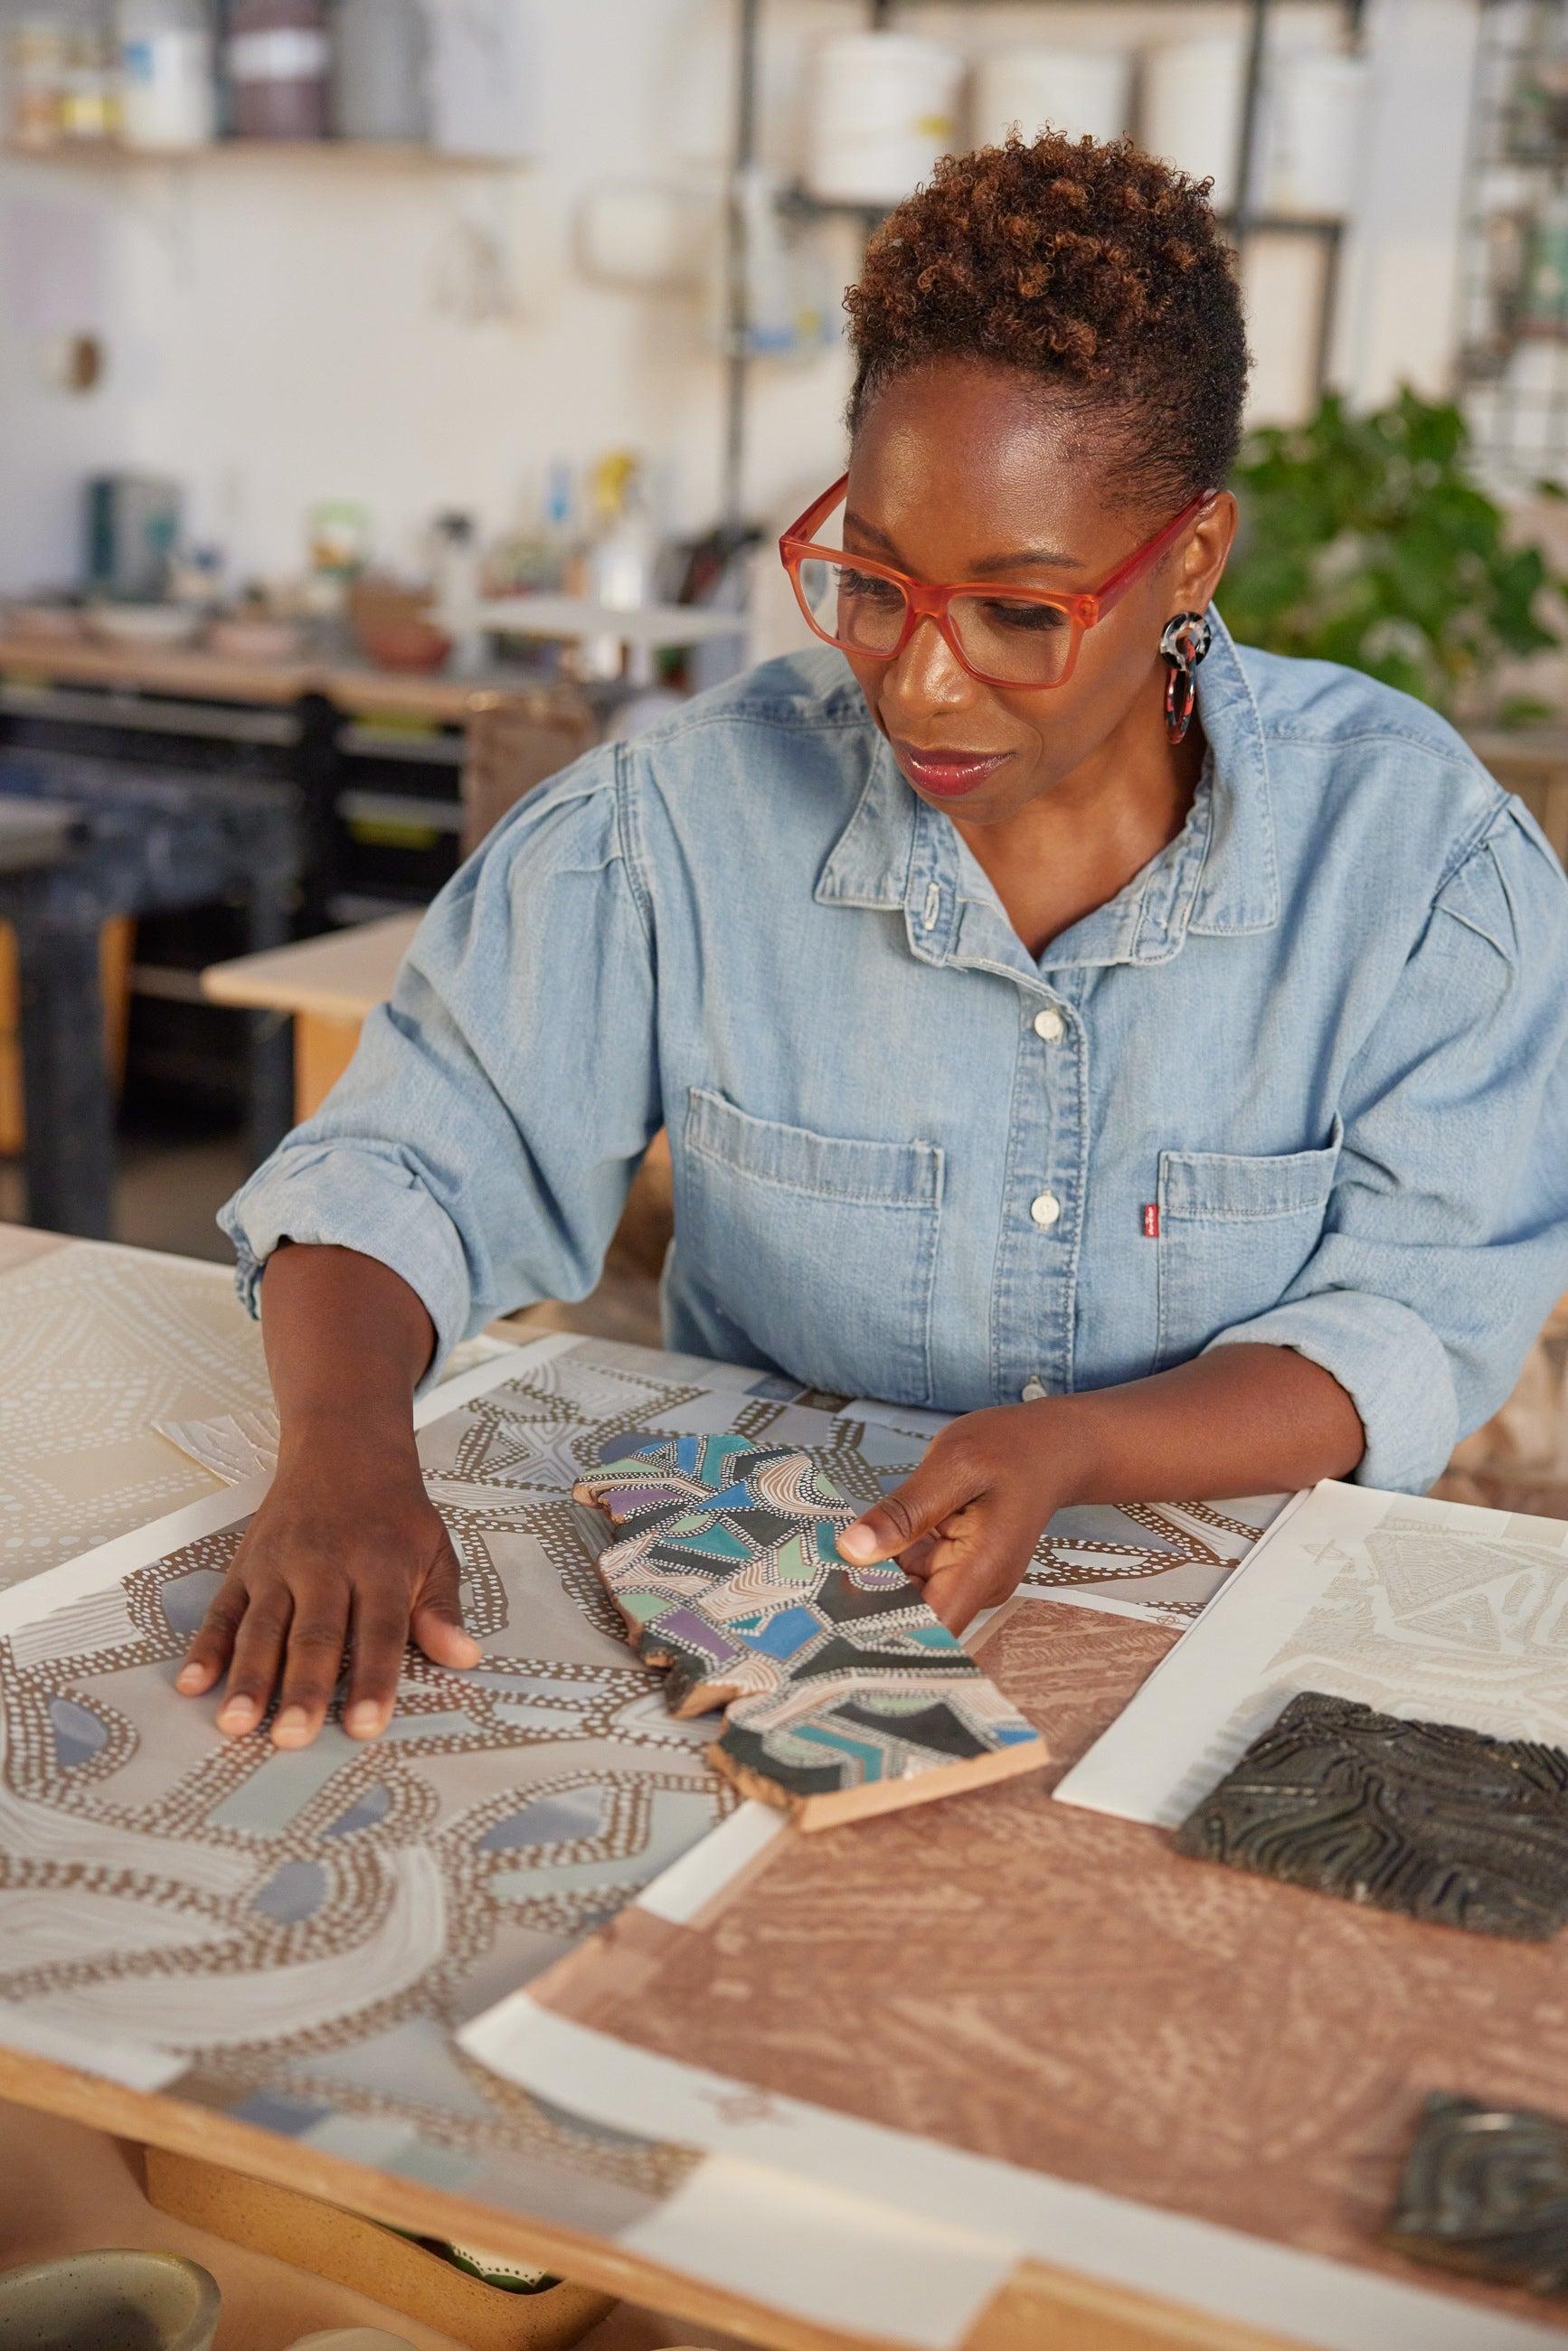 artist looking at wallpaper designs